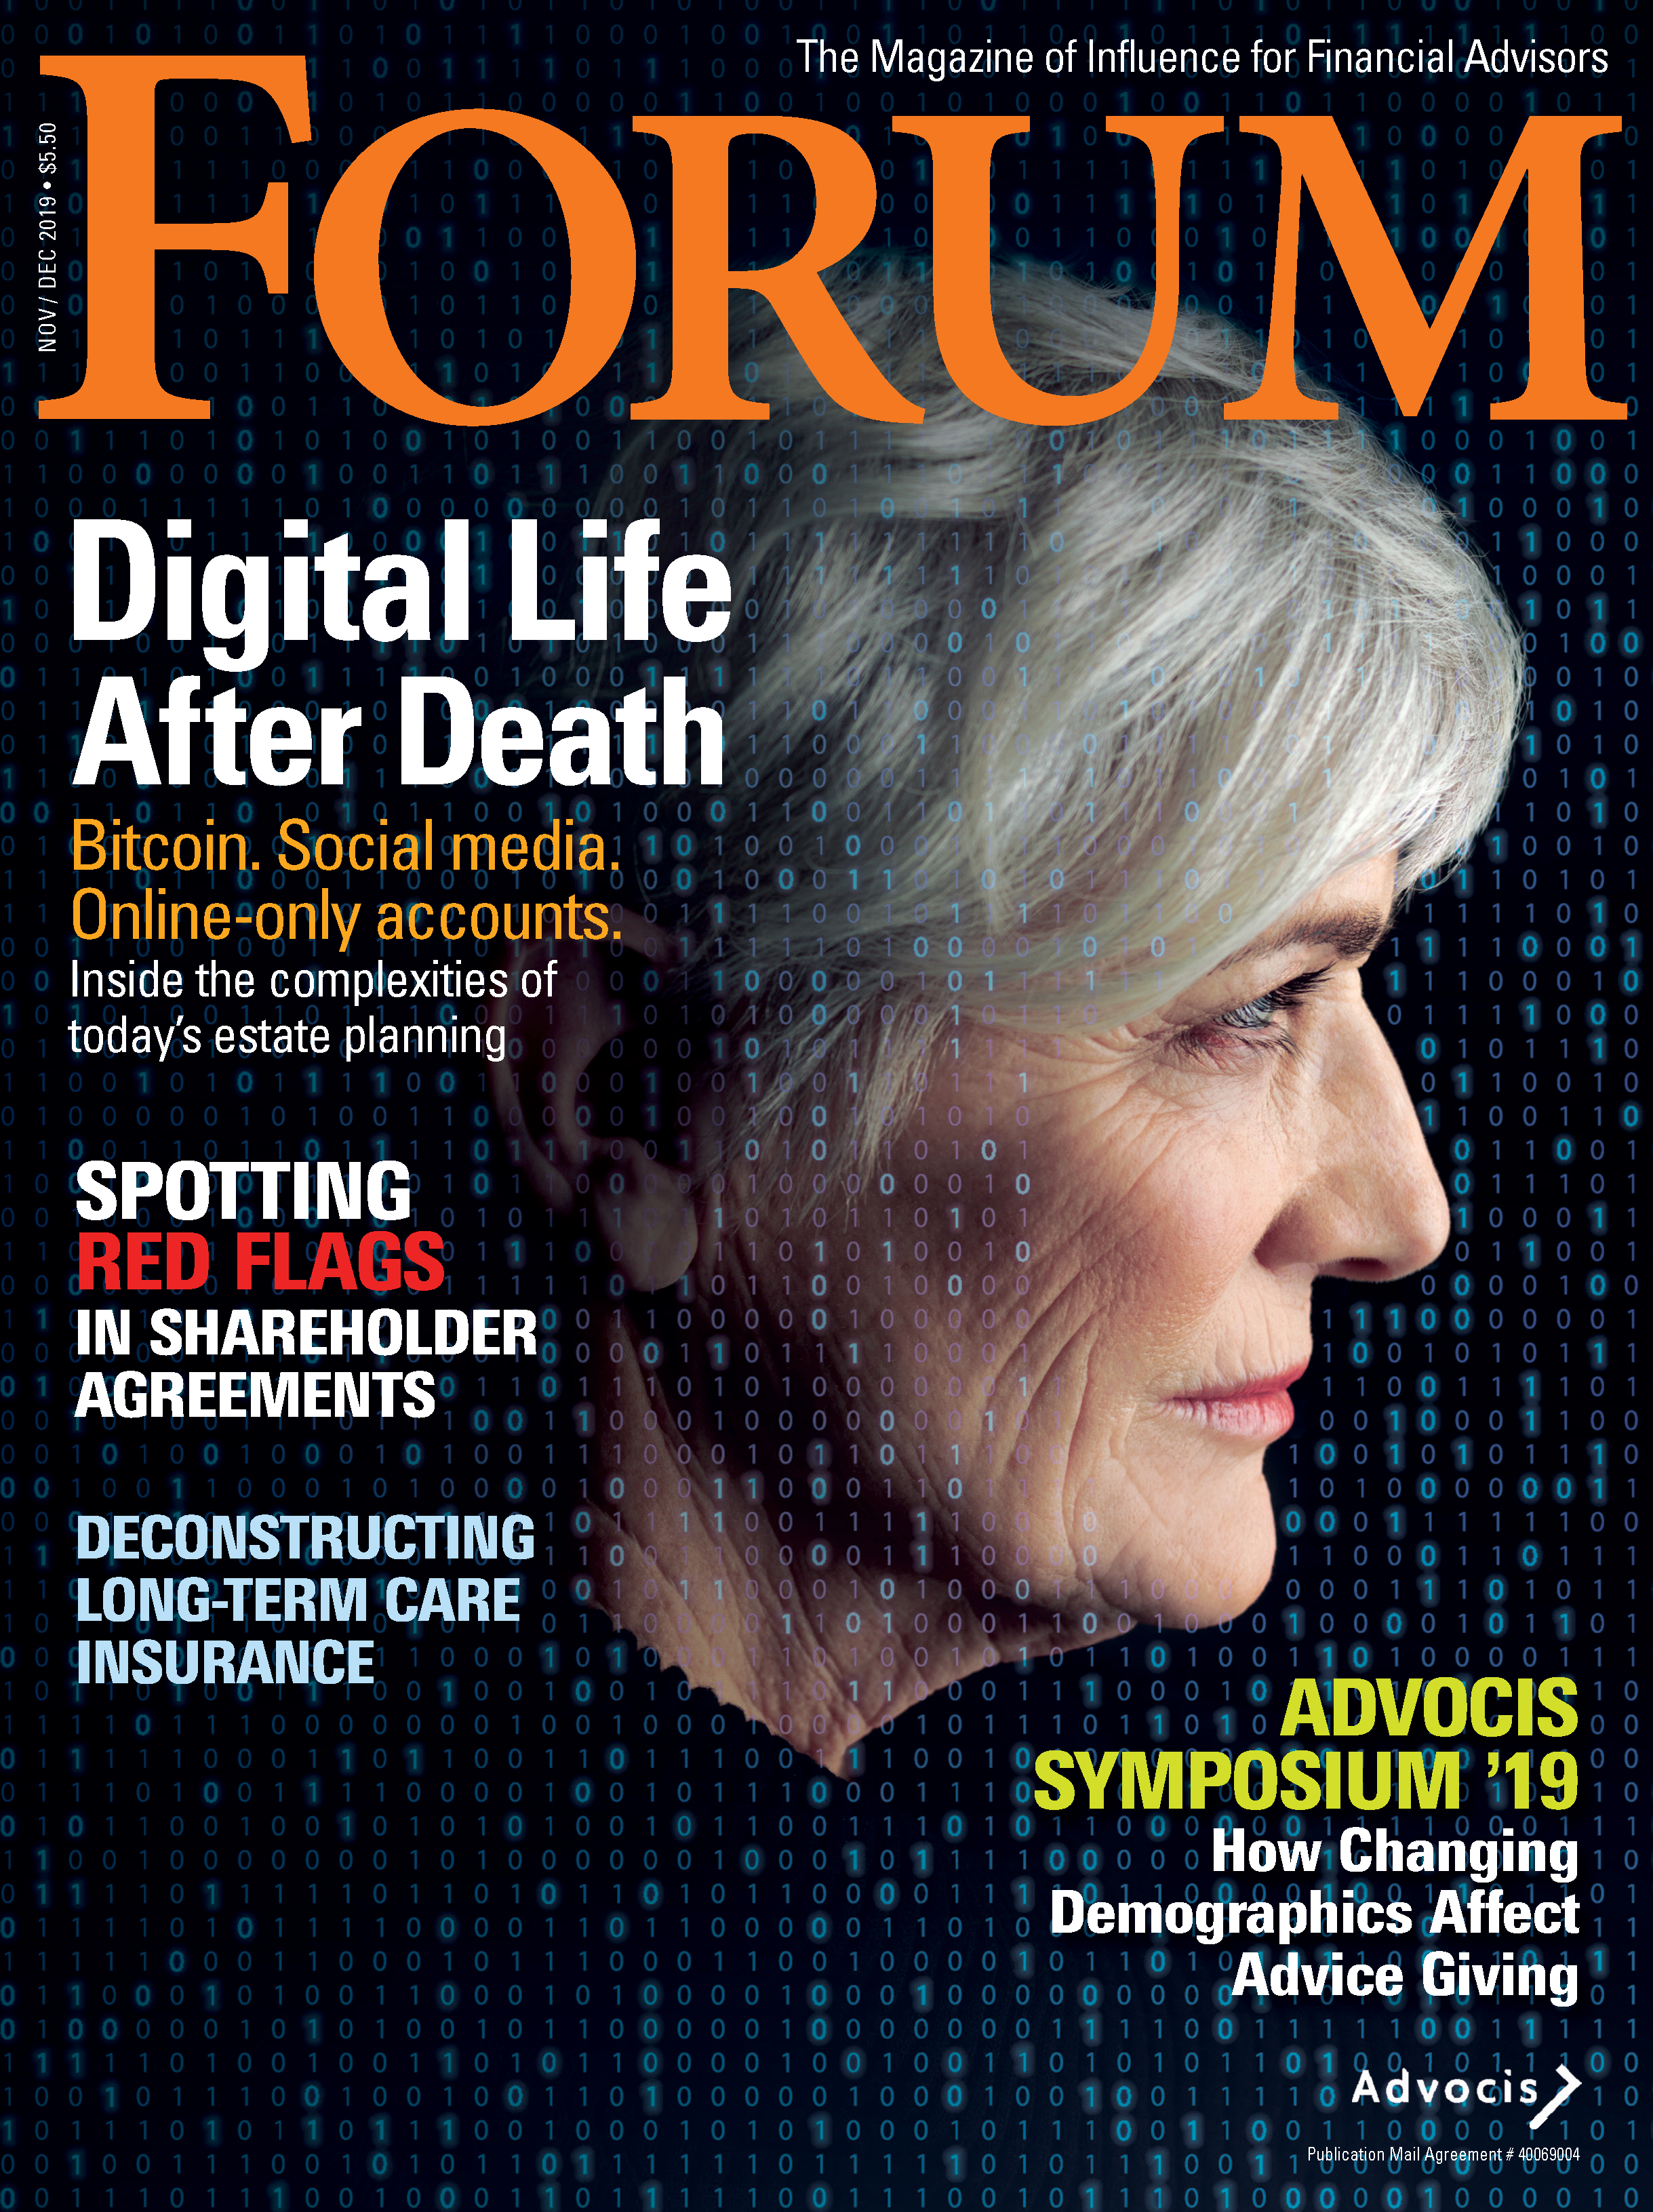 December FORUM 2019 Cover